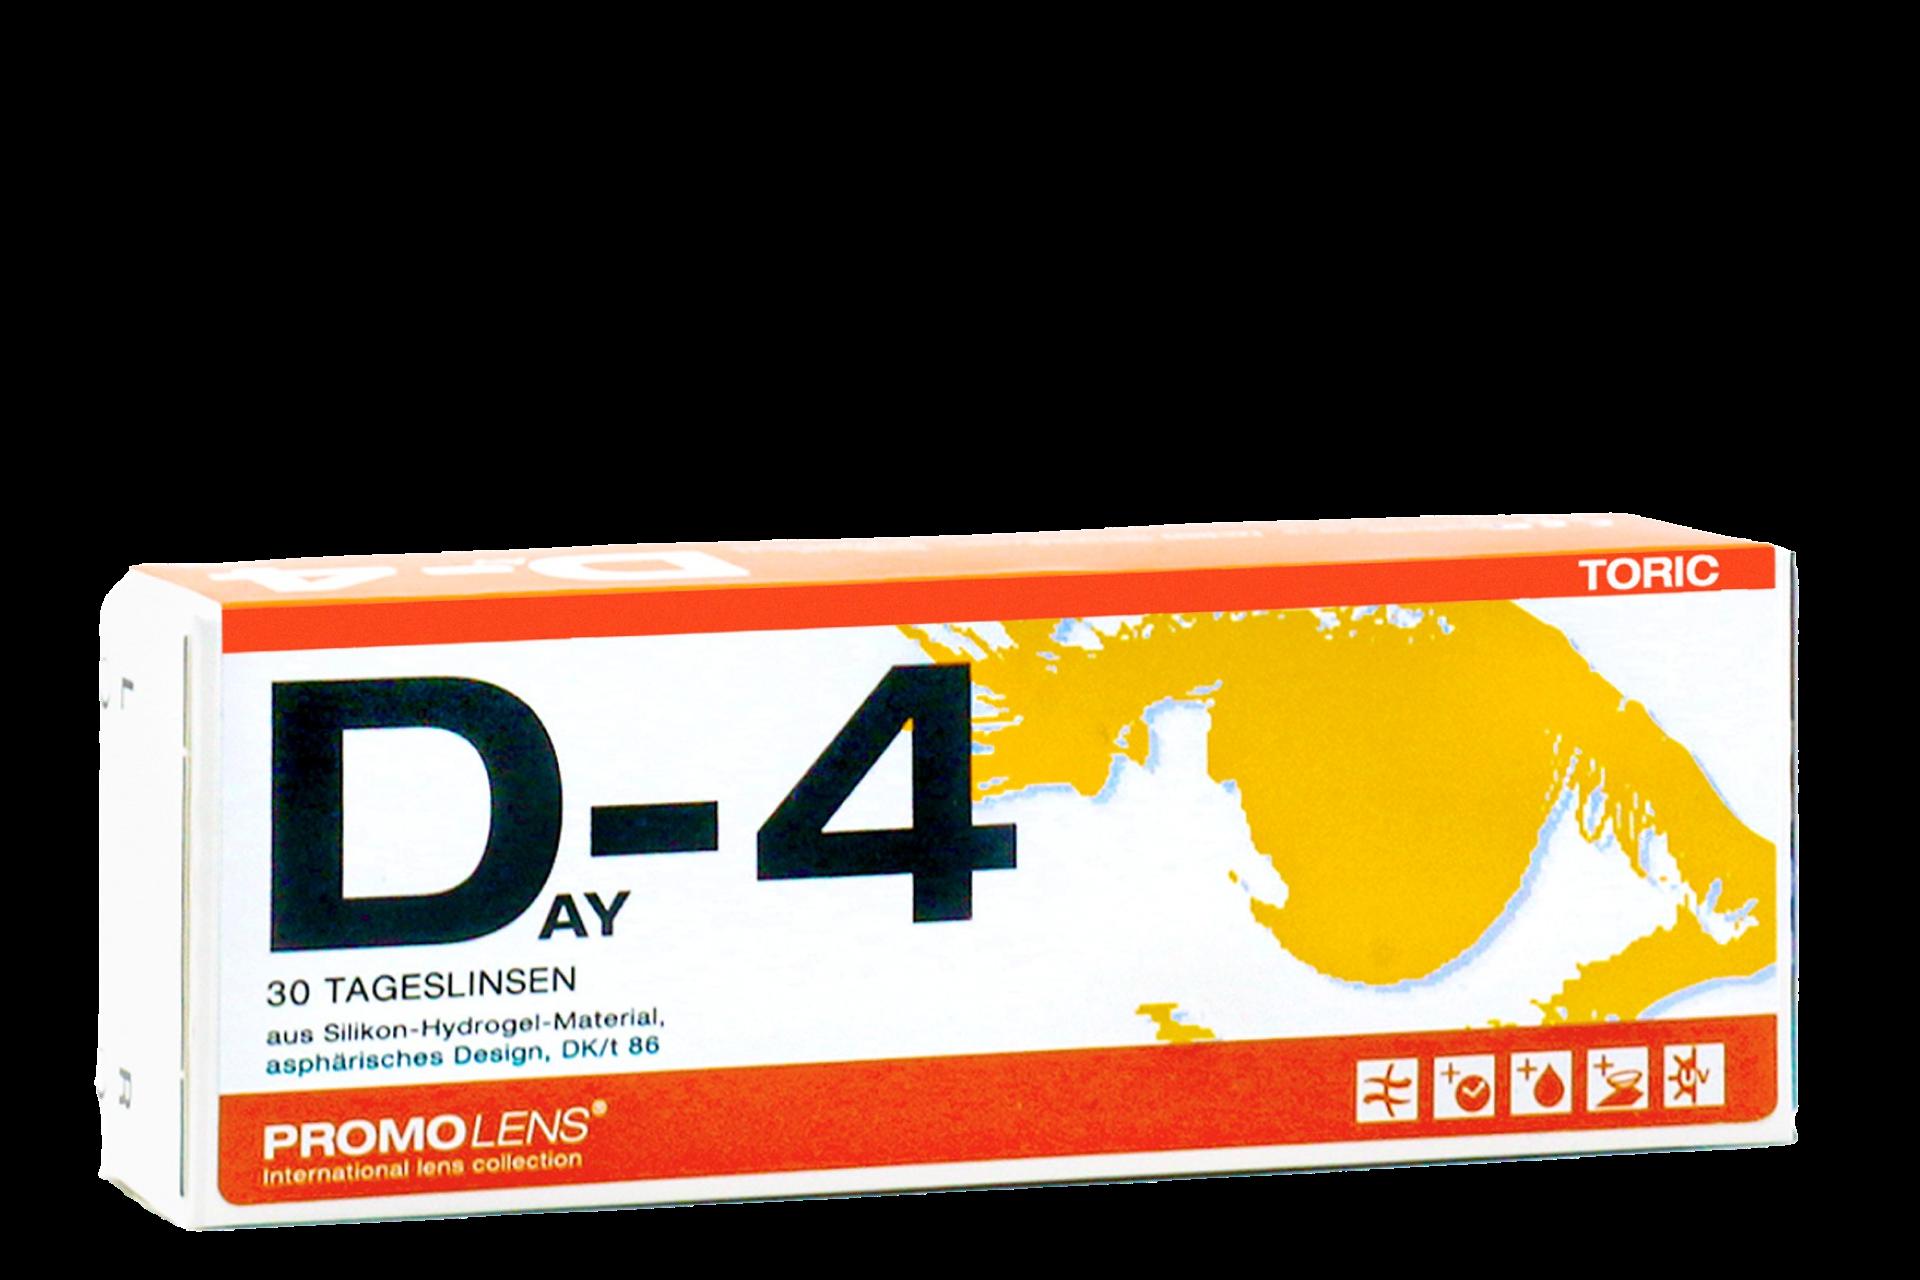 D-4 toric